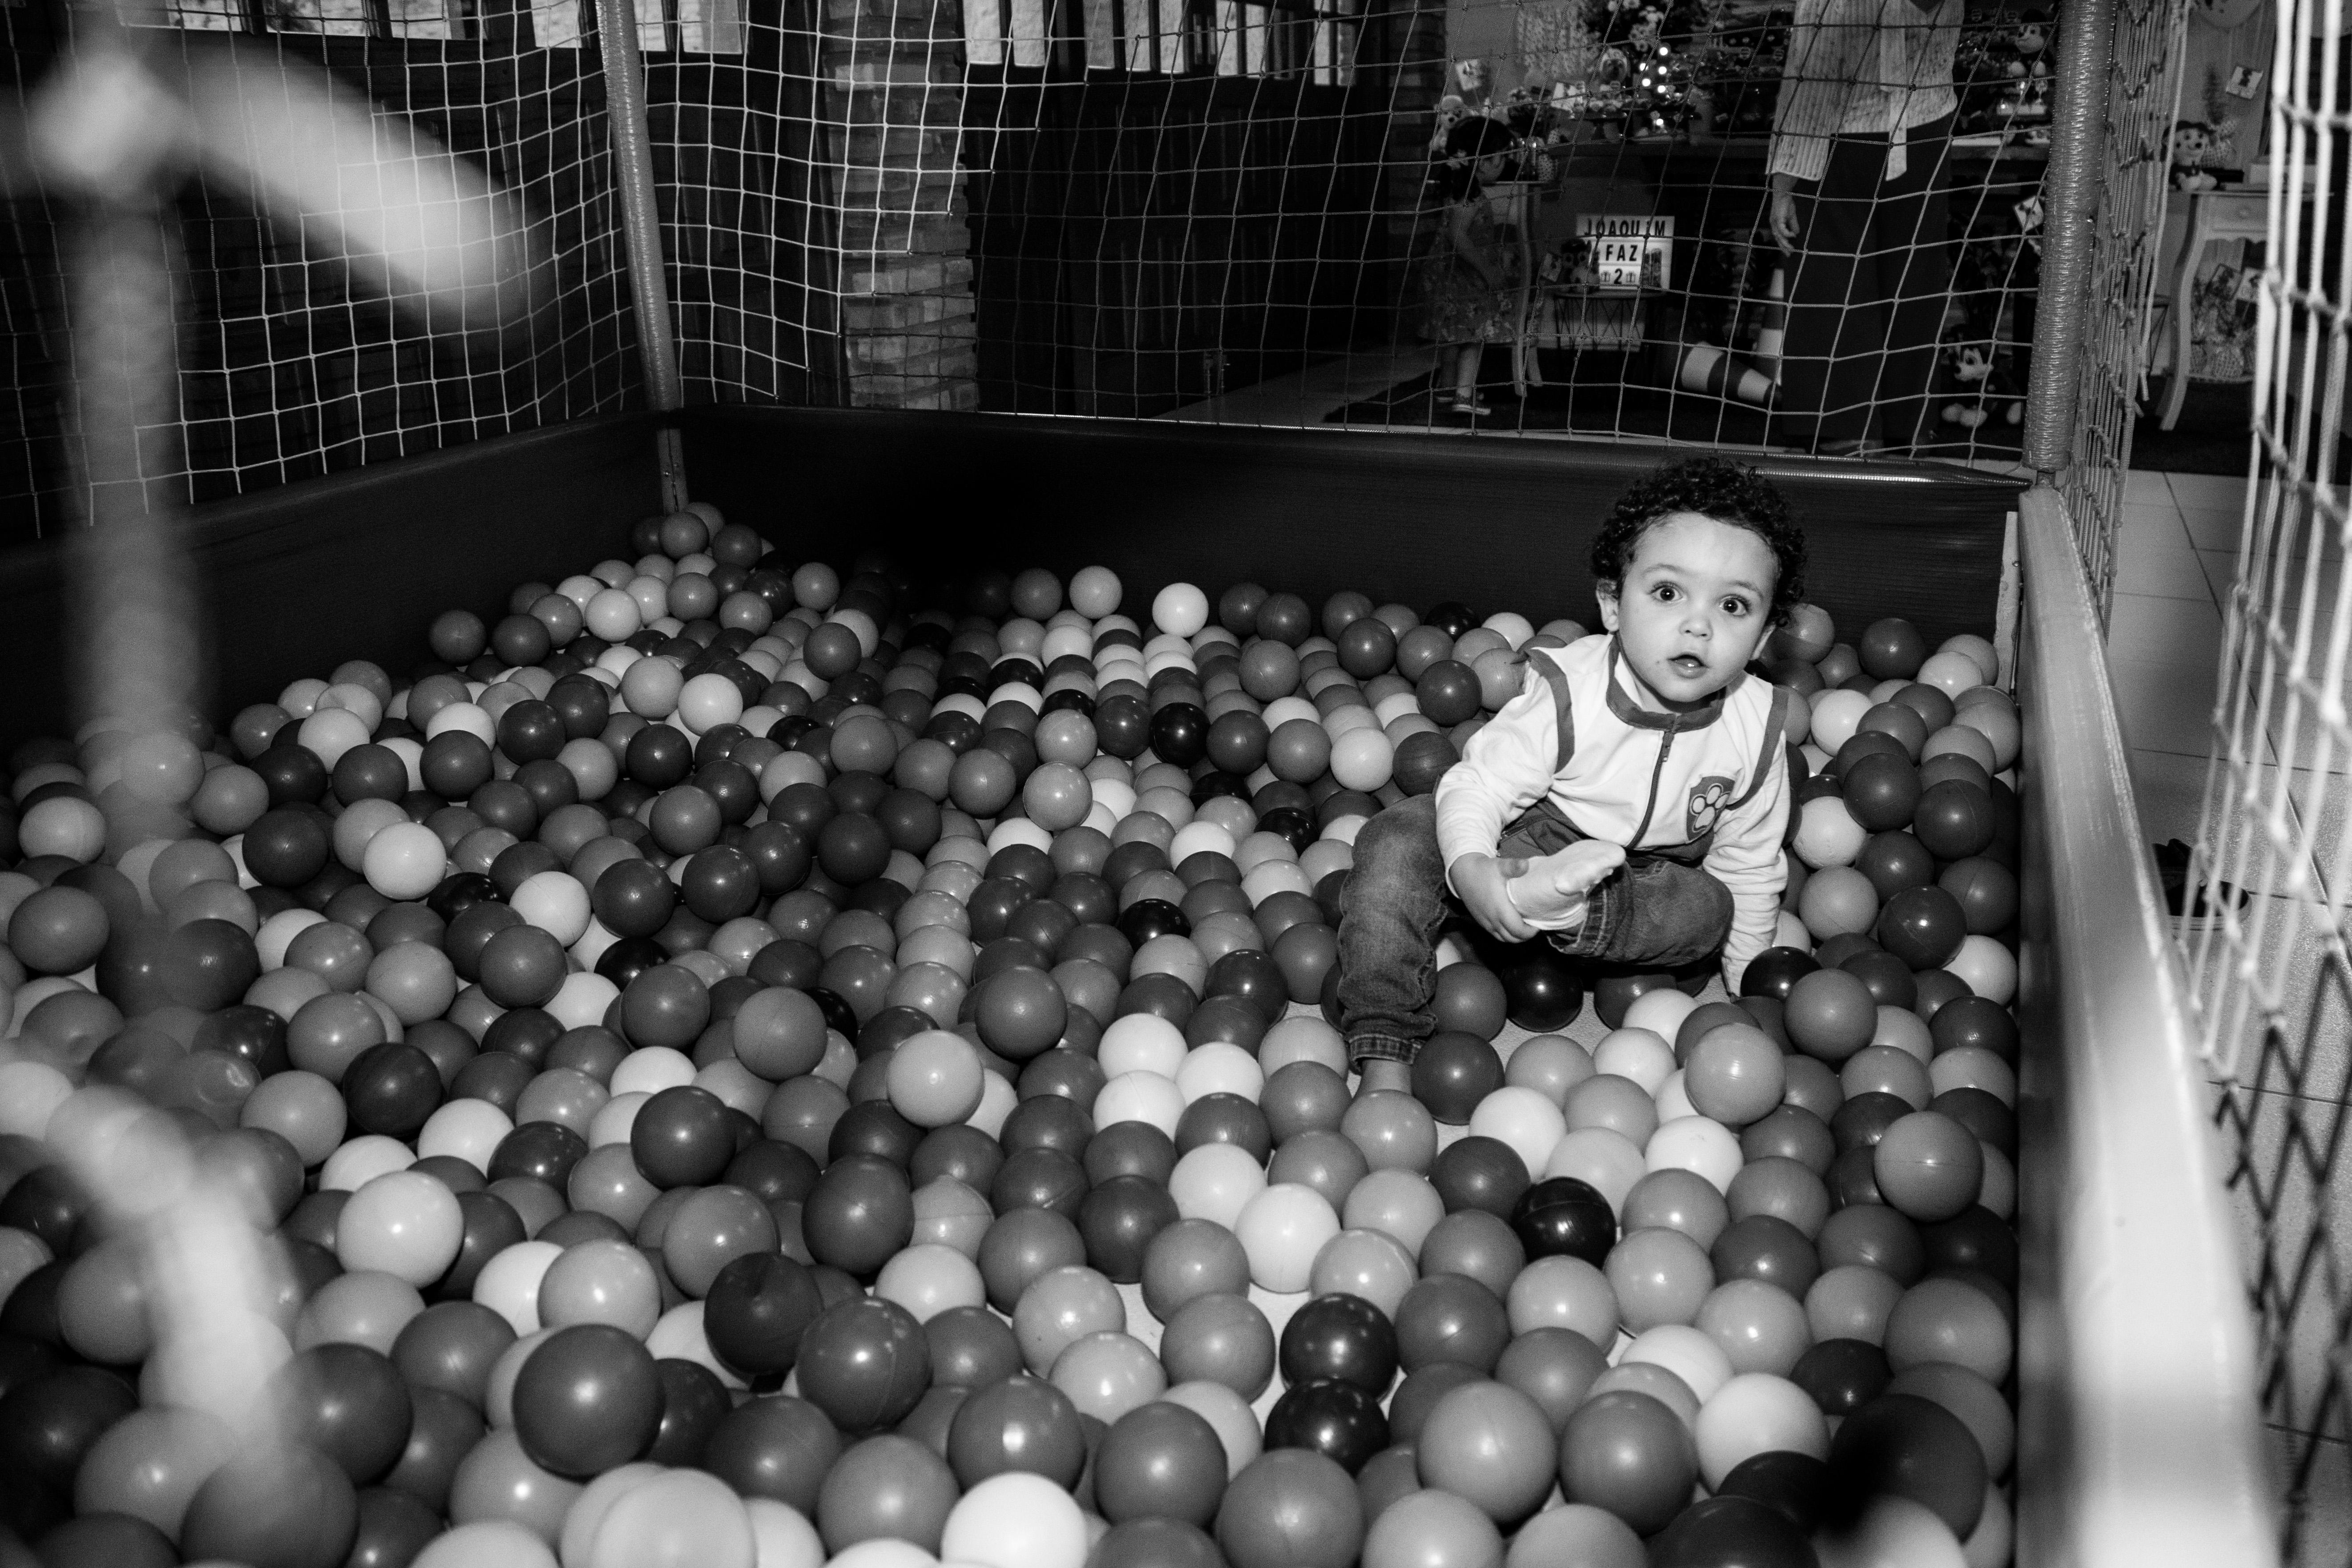 Festa‐Infantil‐Florianopolis‐Ana‐Marmo‐FotografiaFesta‐Infantil‐Florianopolis‐Ana‐Marmo‐Fotografia191A0538